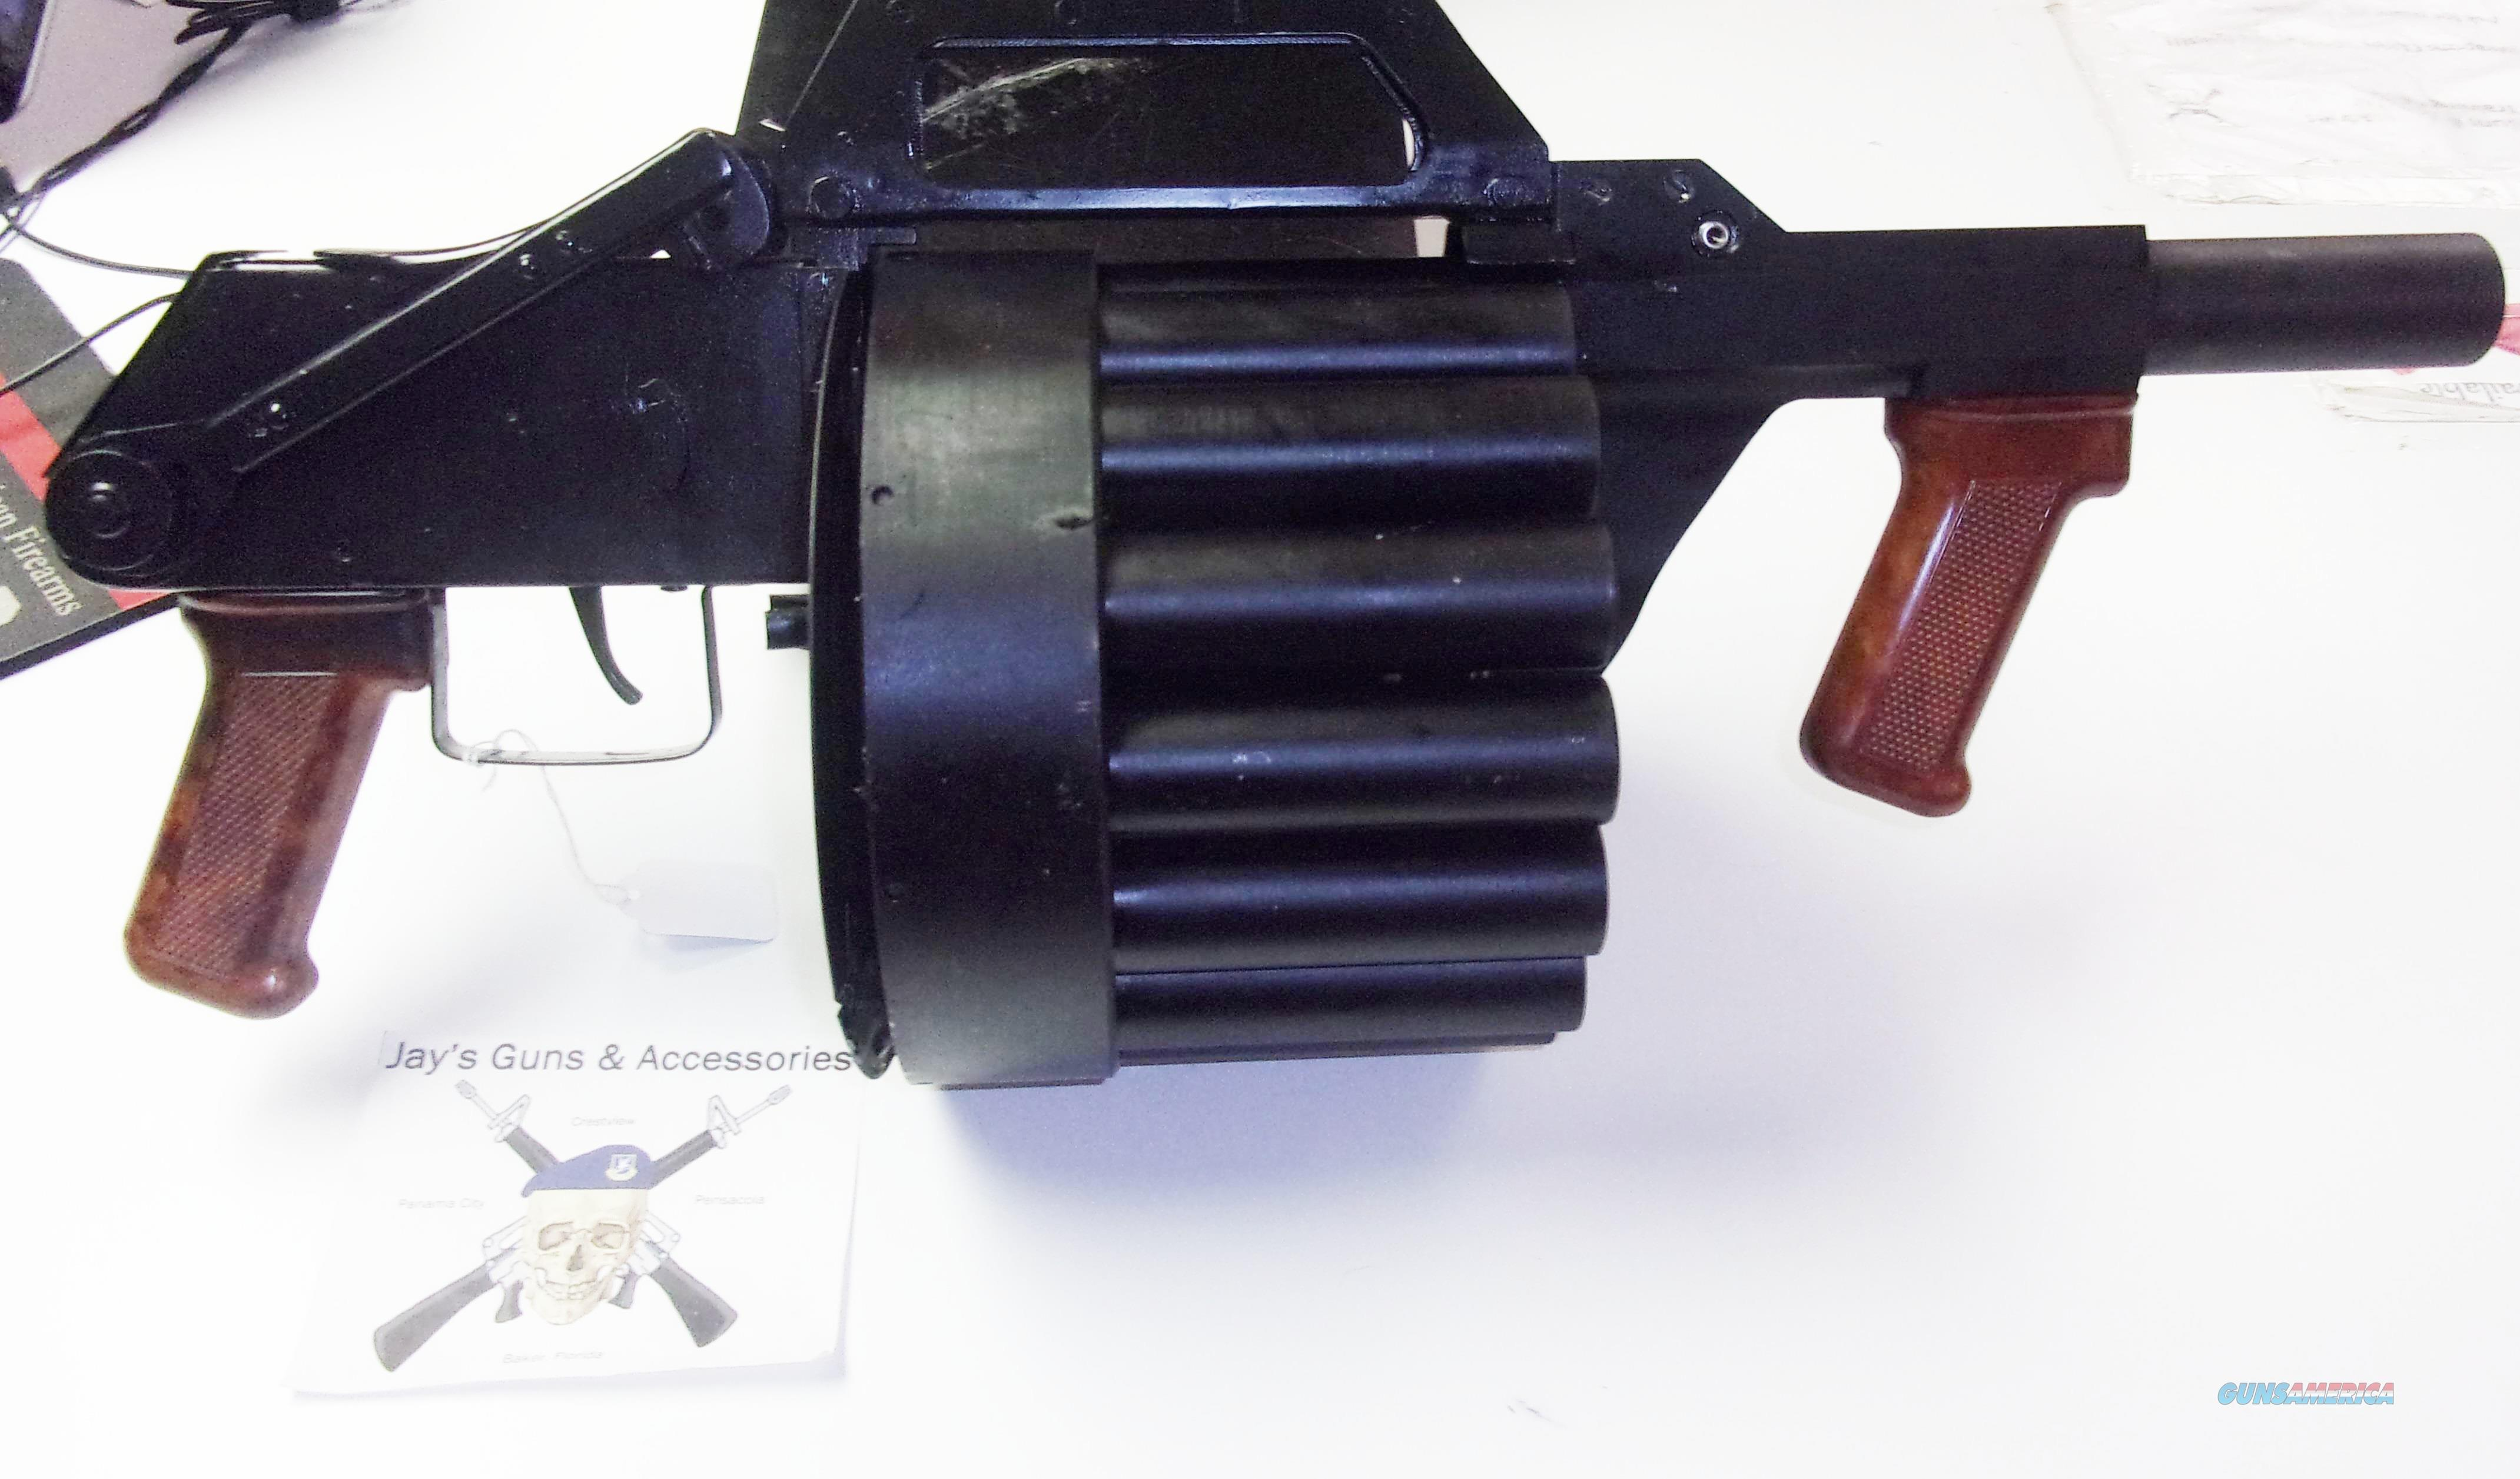 "*RARE* Polish RGA86 15-shot Flare/Smoke Launcher/""Revolver"" (PWPSGL)  Non-Guns > Launchers - Non Lethal"